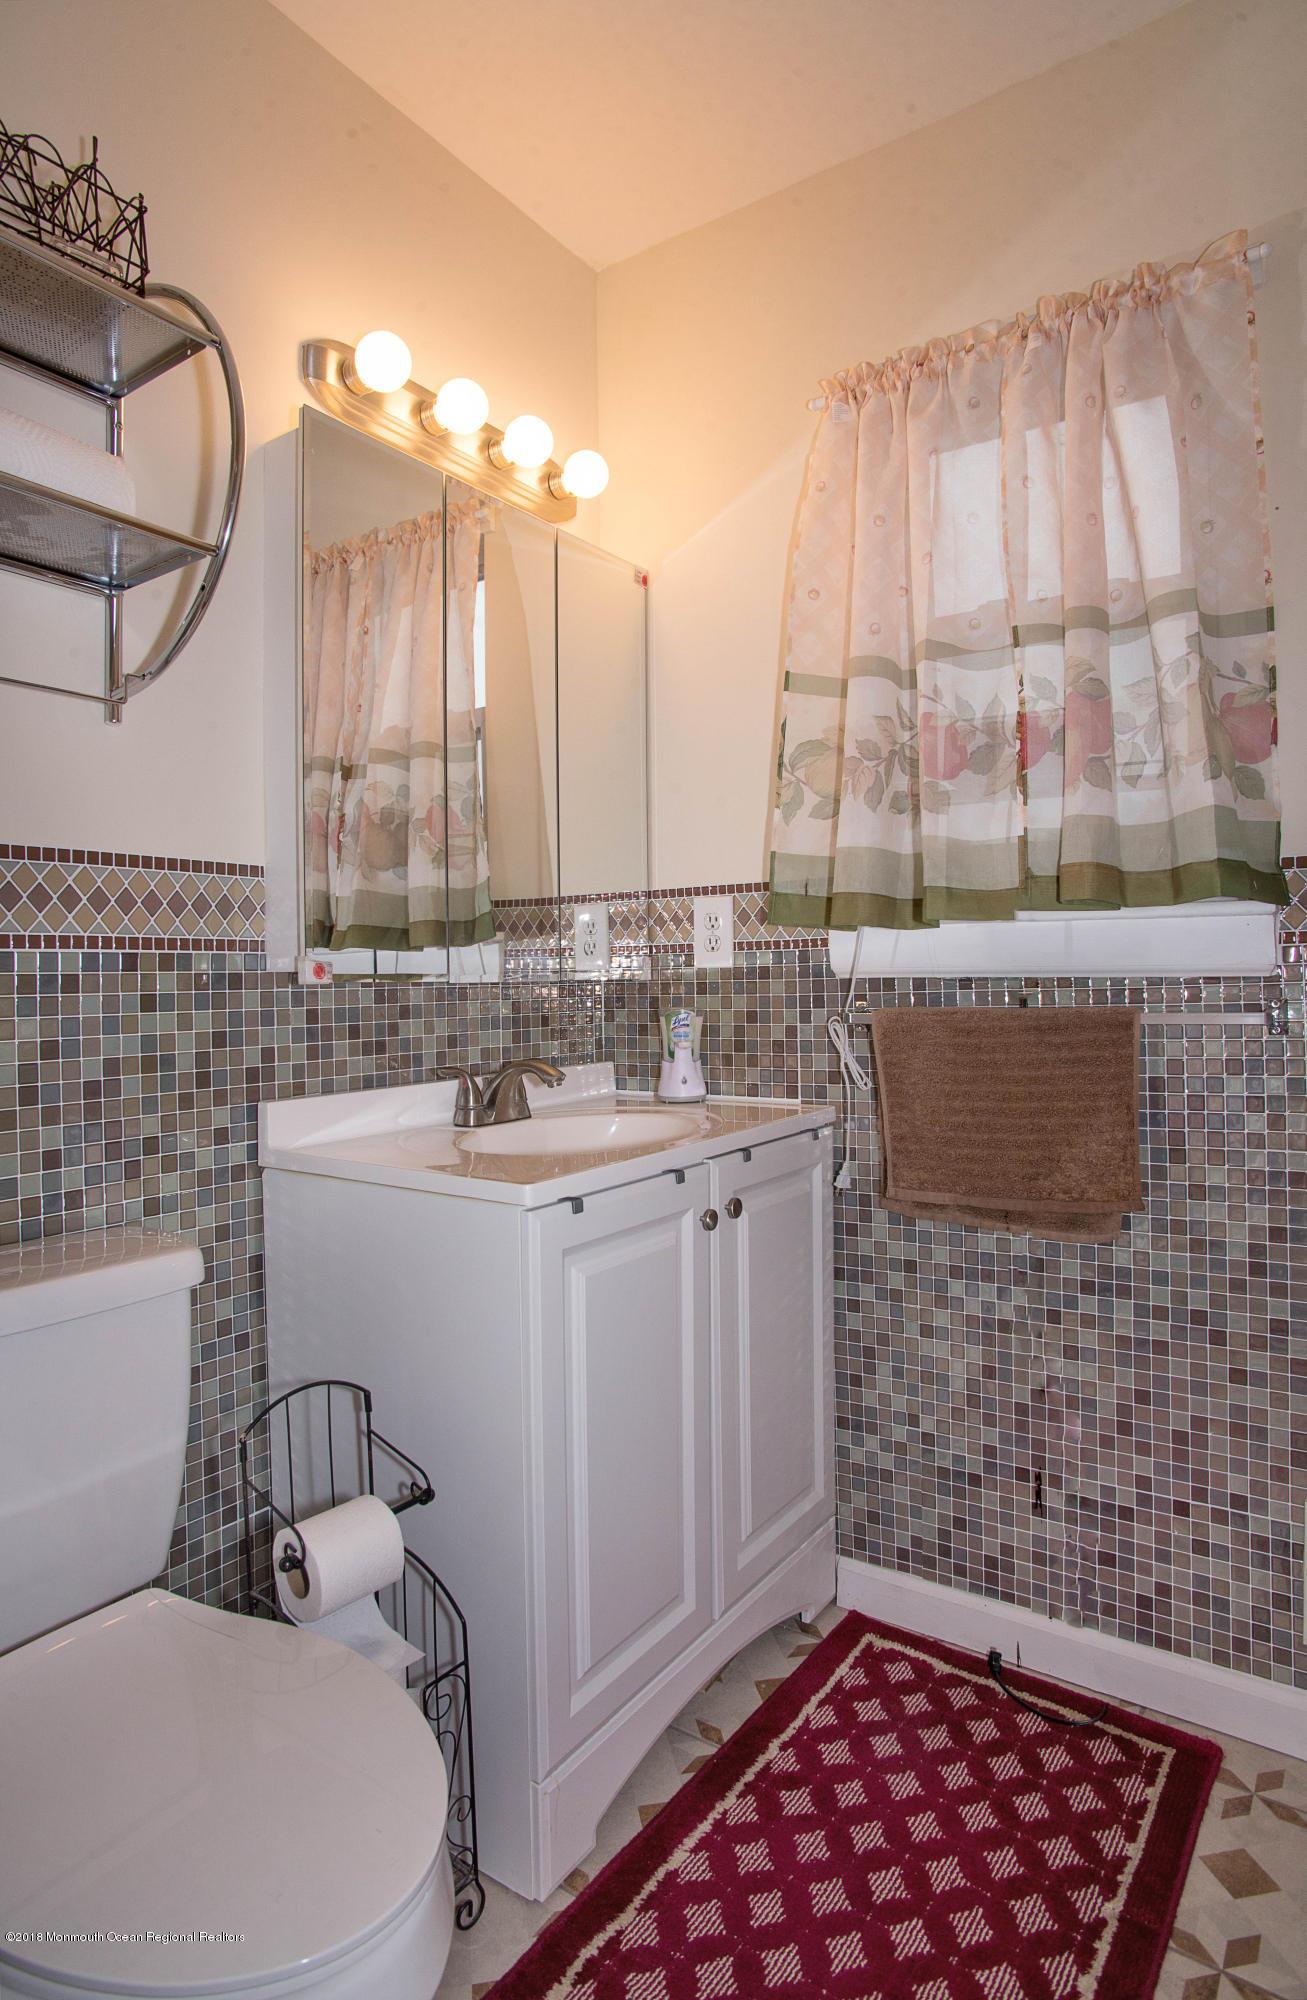 _RMJ7253.jpg master bathroom